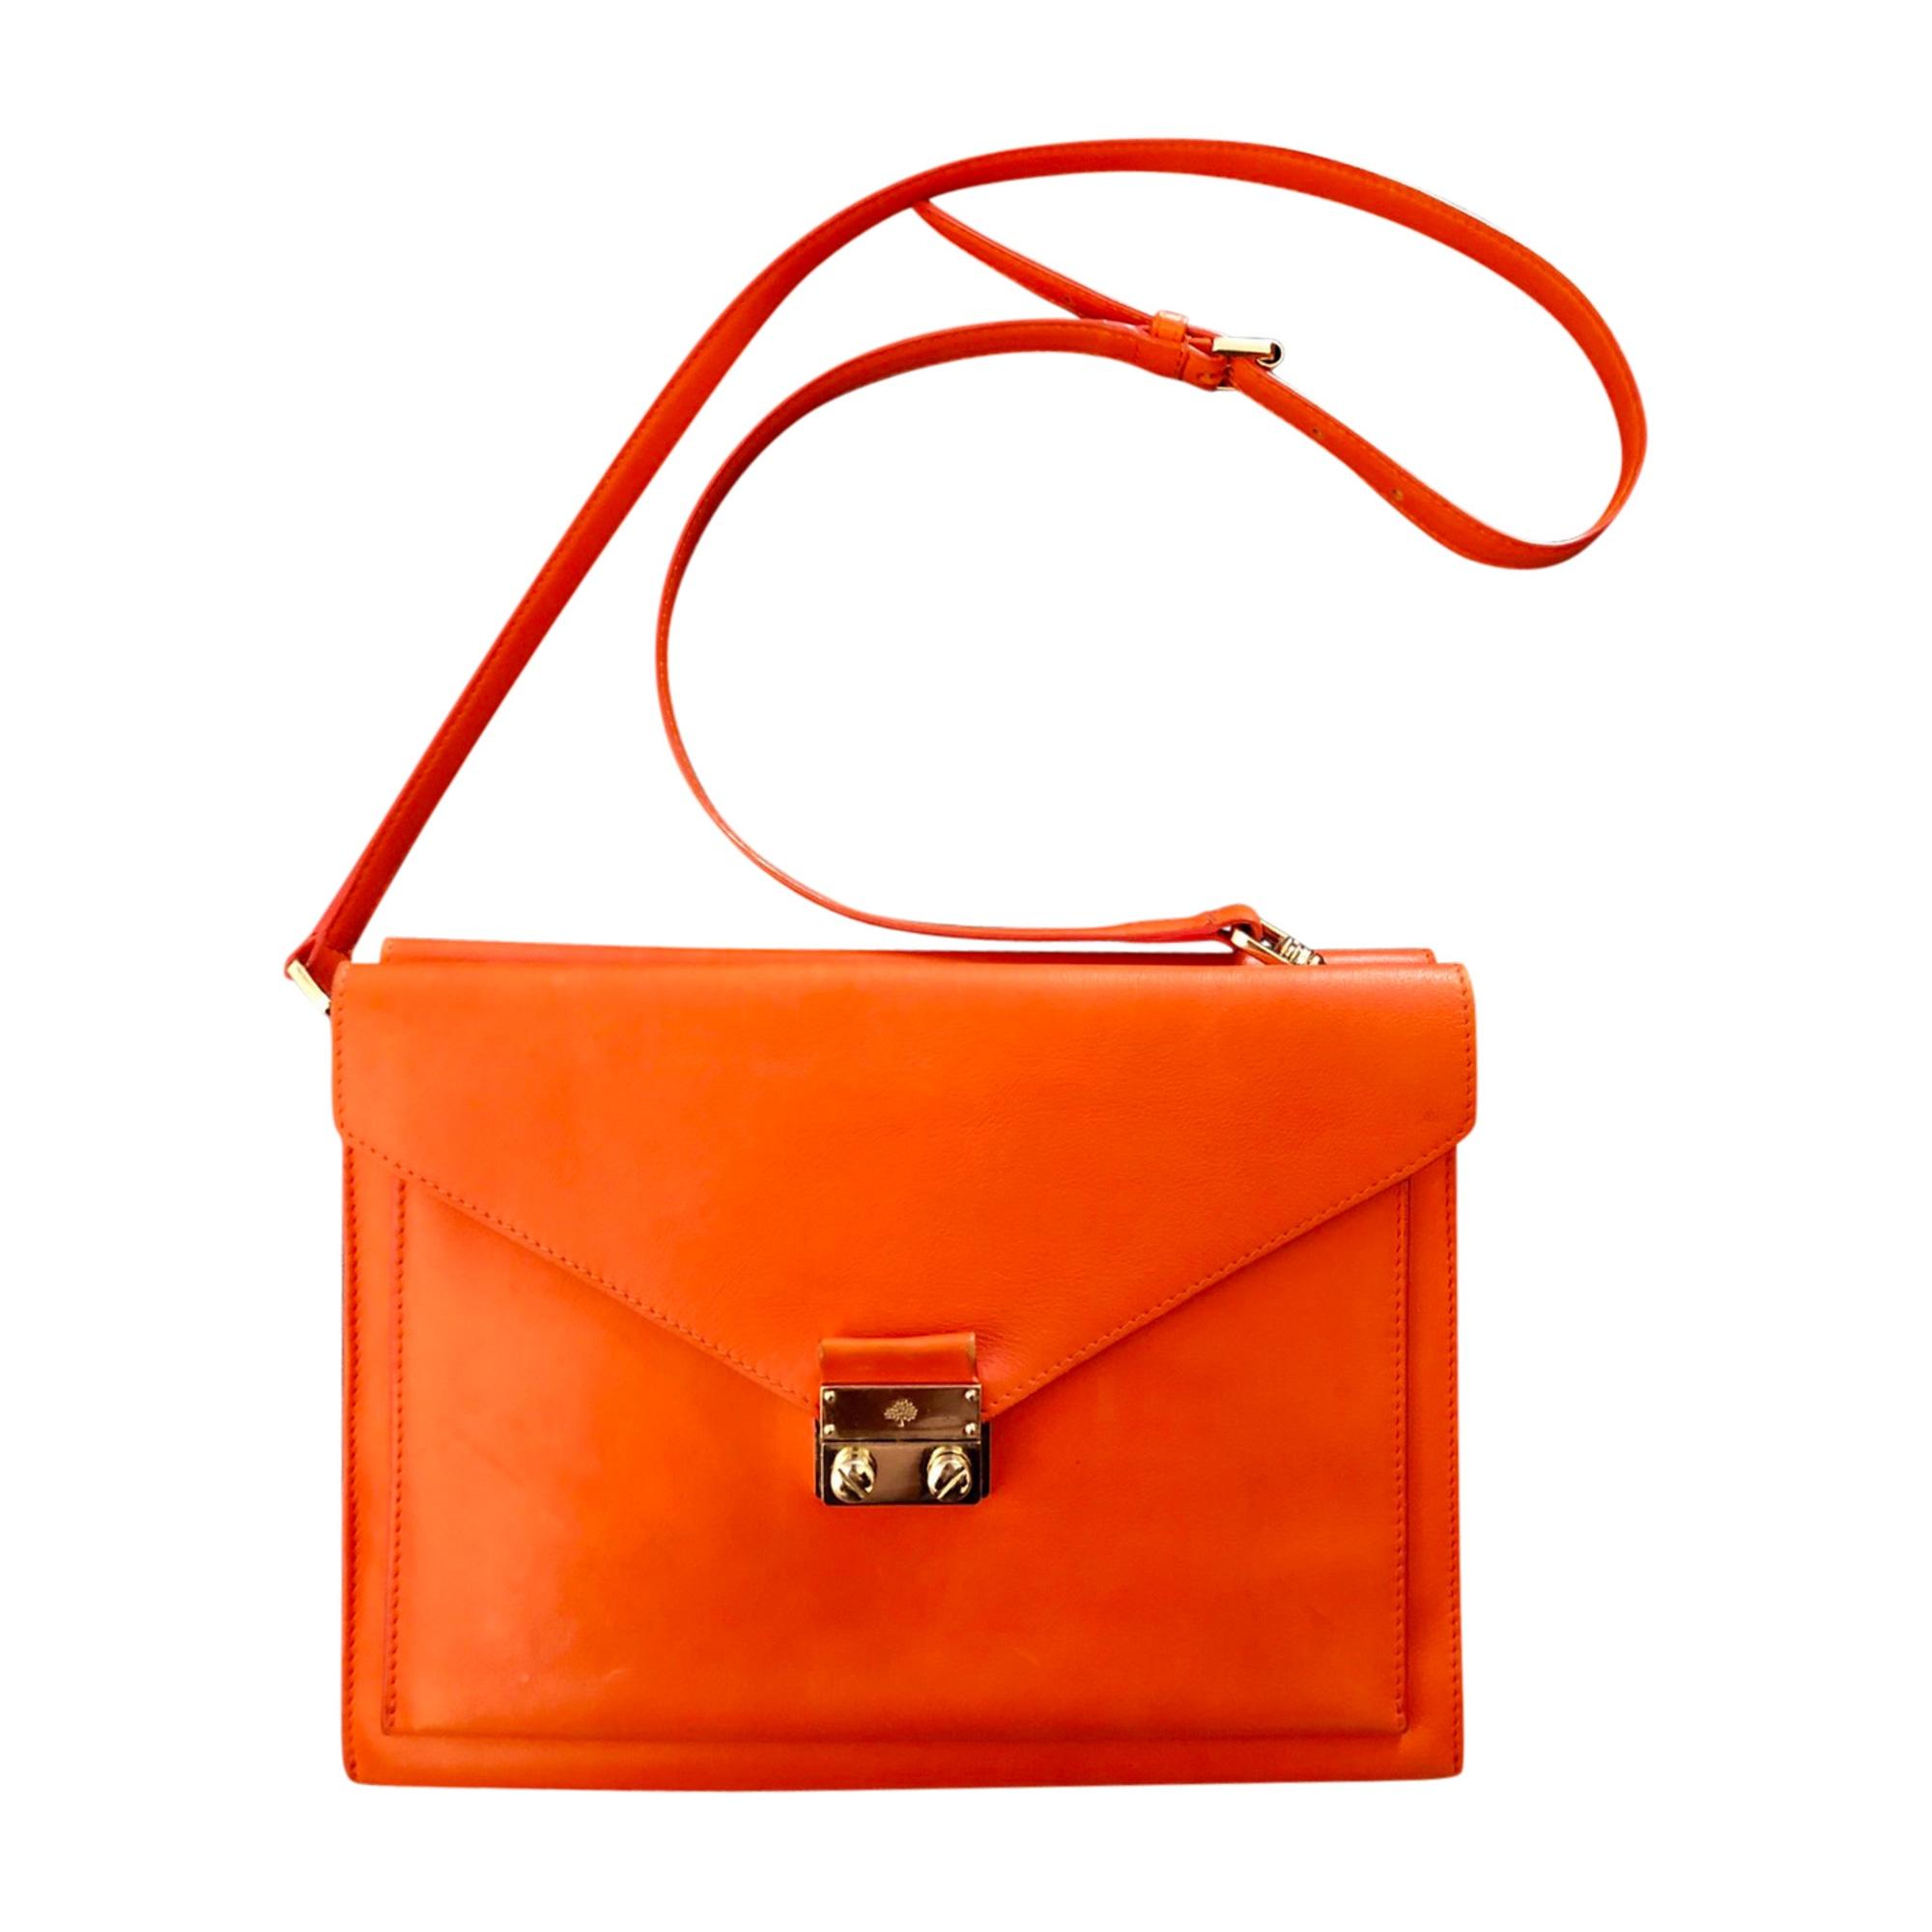 Sac pochette en cuir MULBERRY cuir orange